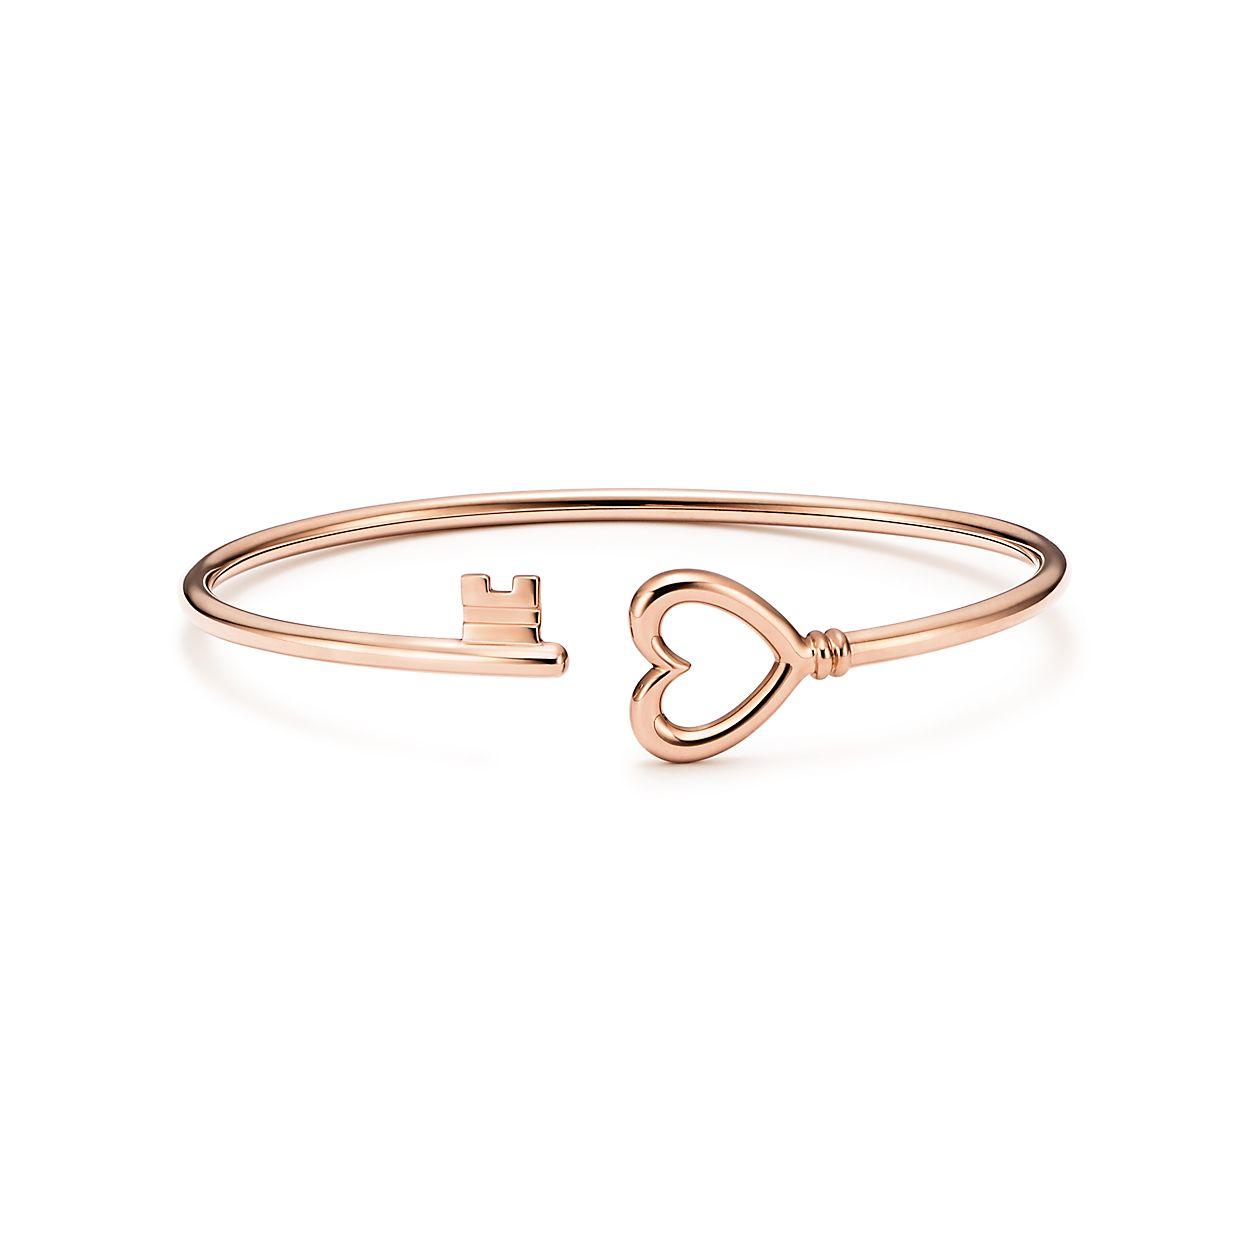 Tiffany Hearts bracelet in platinum with diamonds - Size 6.25 IN Tiffany & Co. HfxdAl